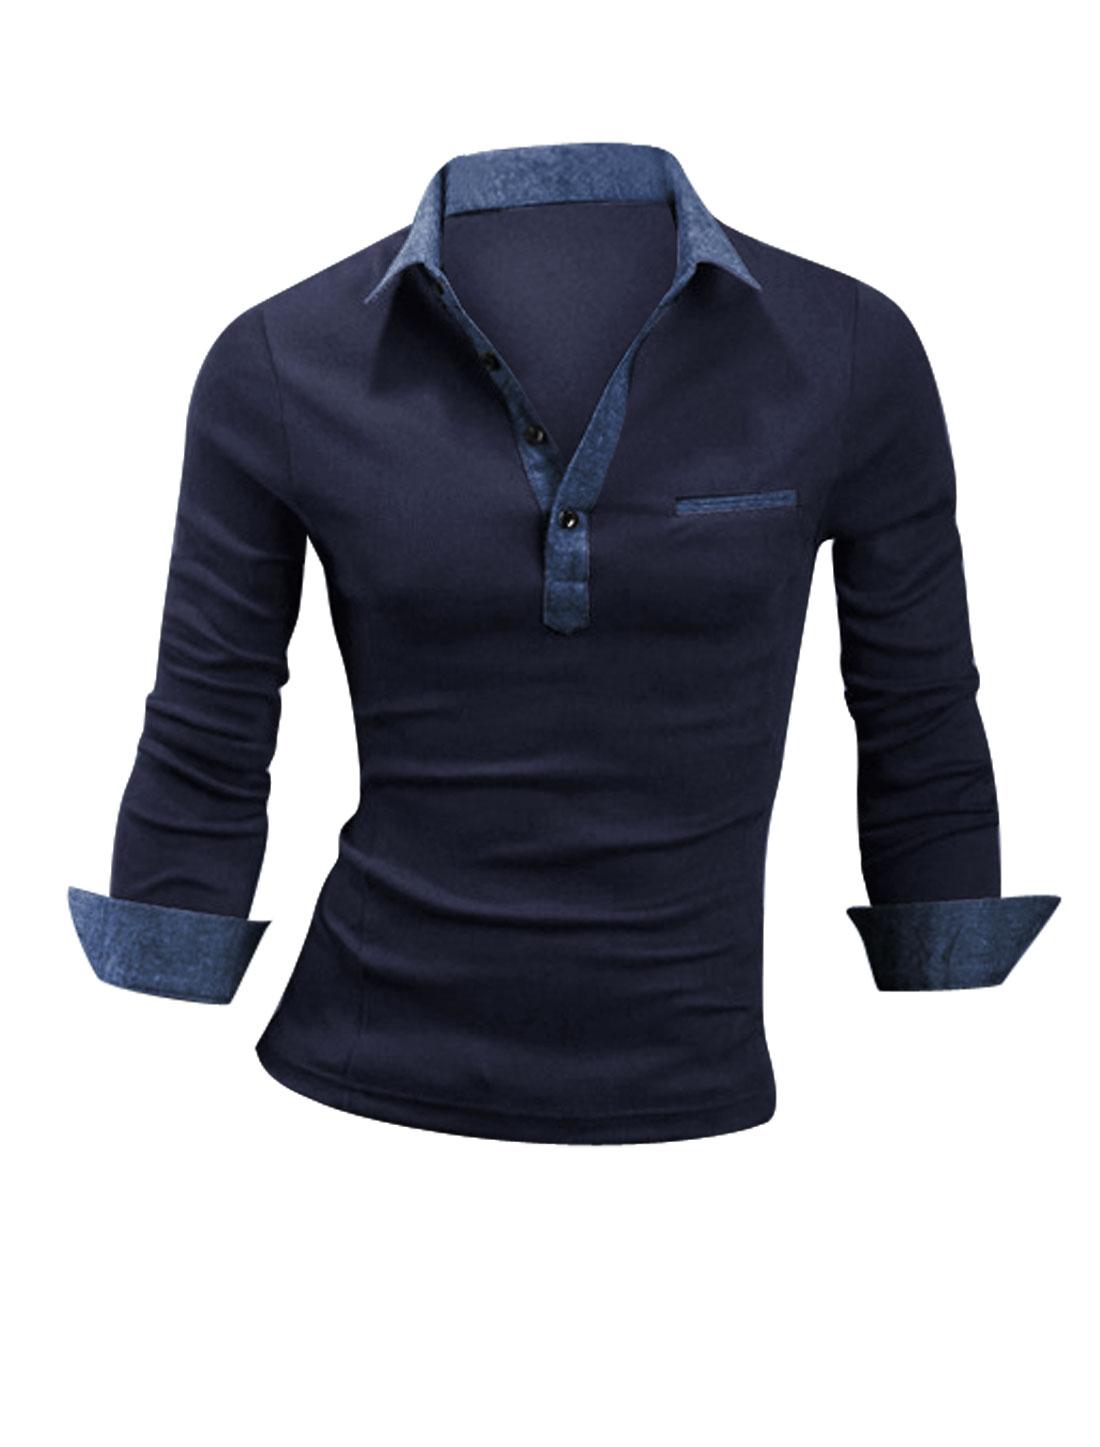 Man Long Sleeve Mock Chest Pocket Button Cuffs Polo Shirt Navy Blue M